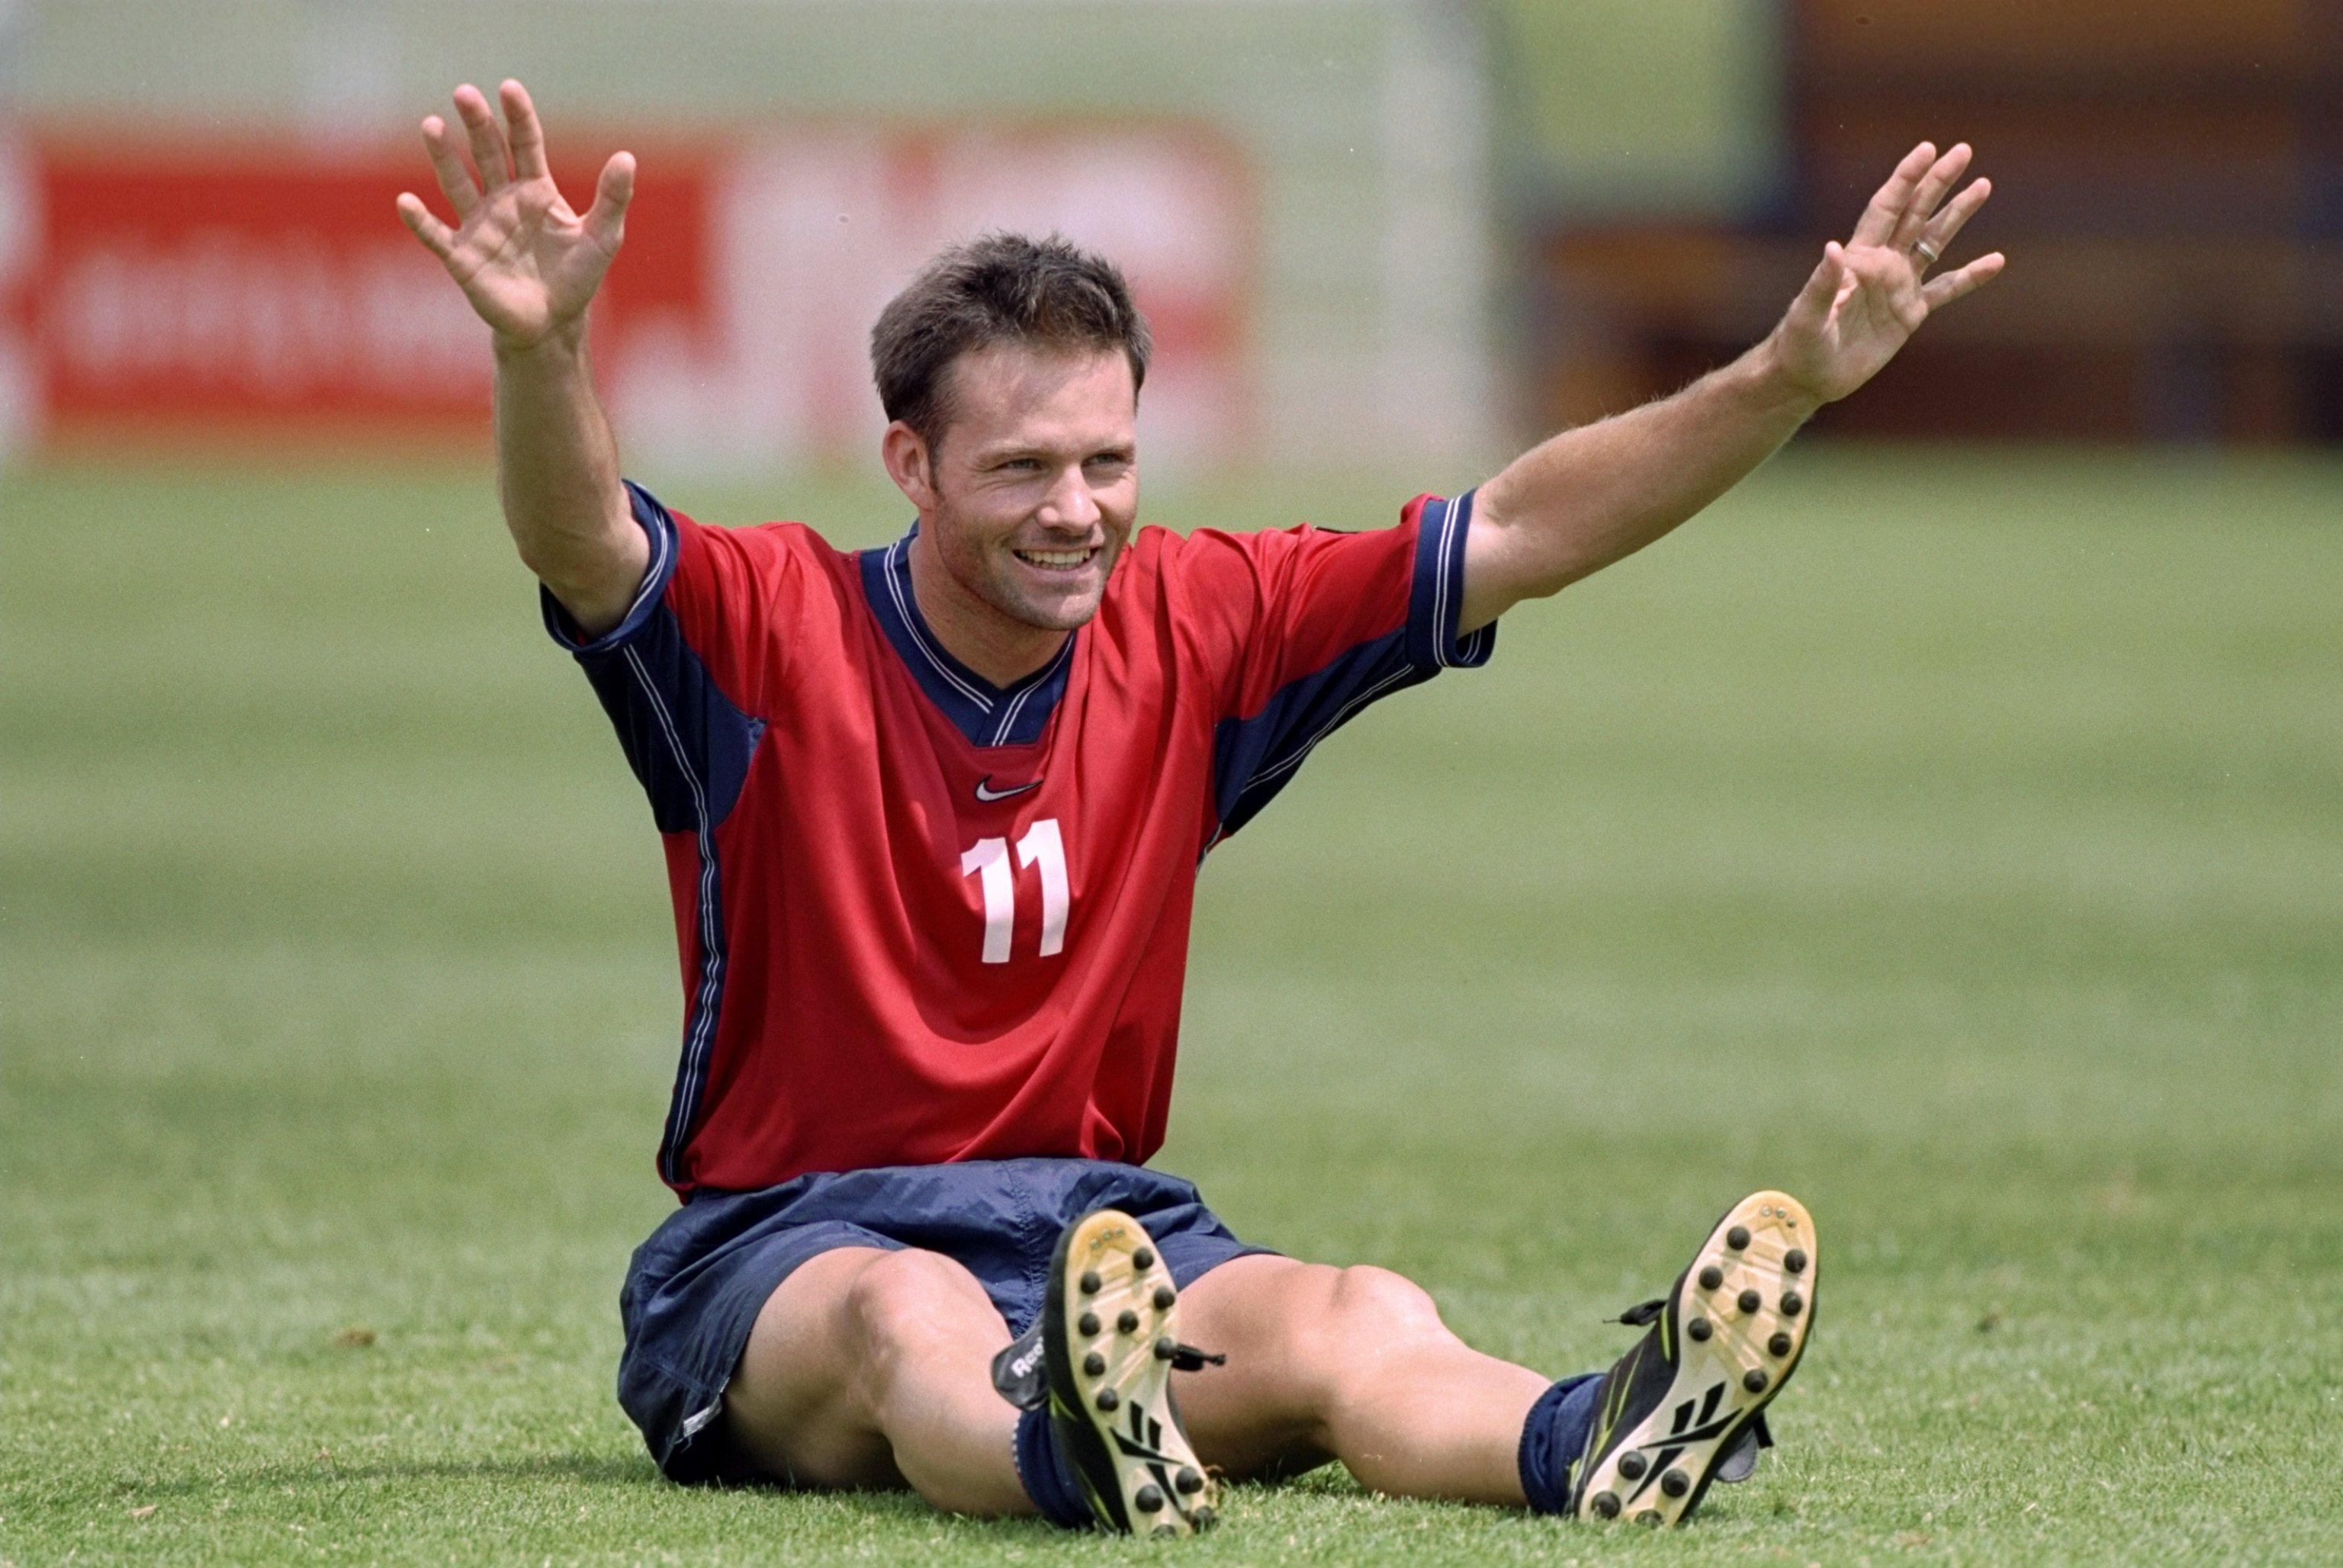 Me defraudaste Ecuador, no volvere a creer en ti USA 2-1 ECU